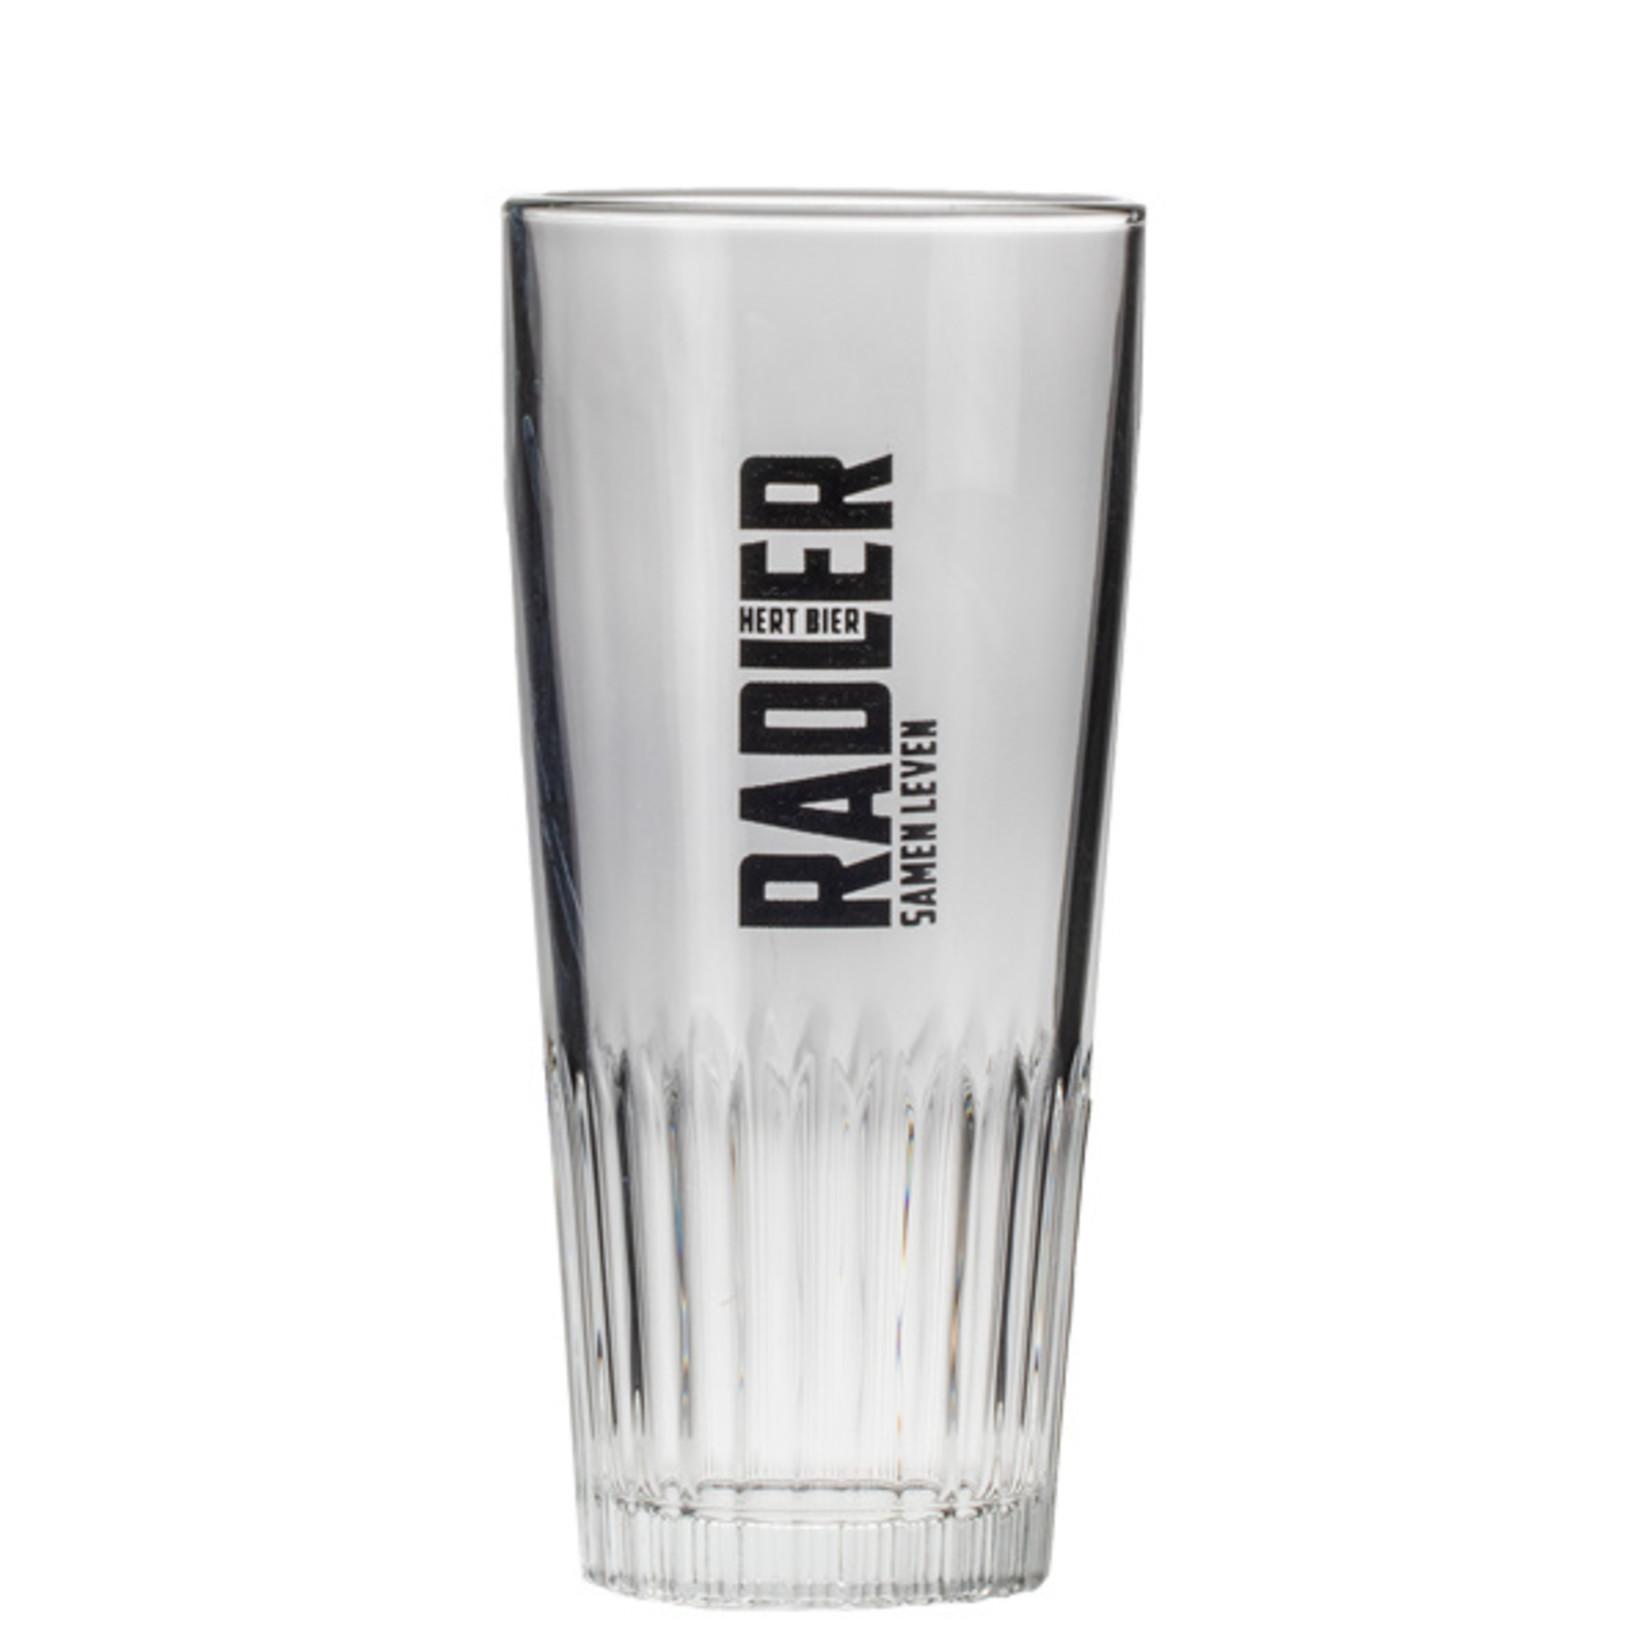 Hert Bier Hert Bier Radlerglas 25cl